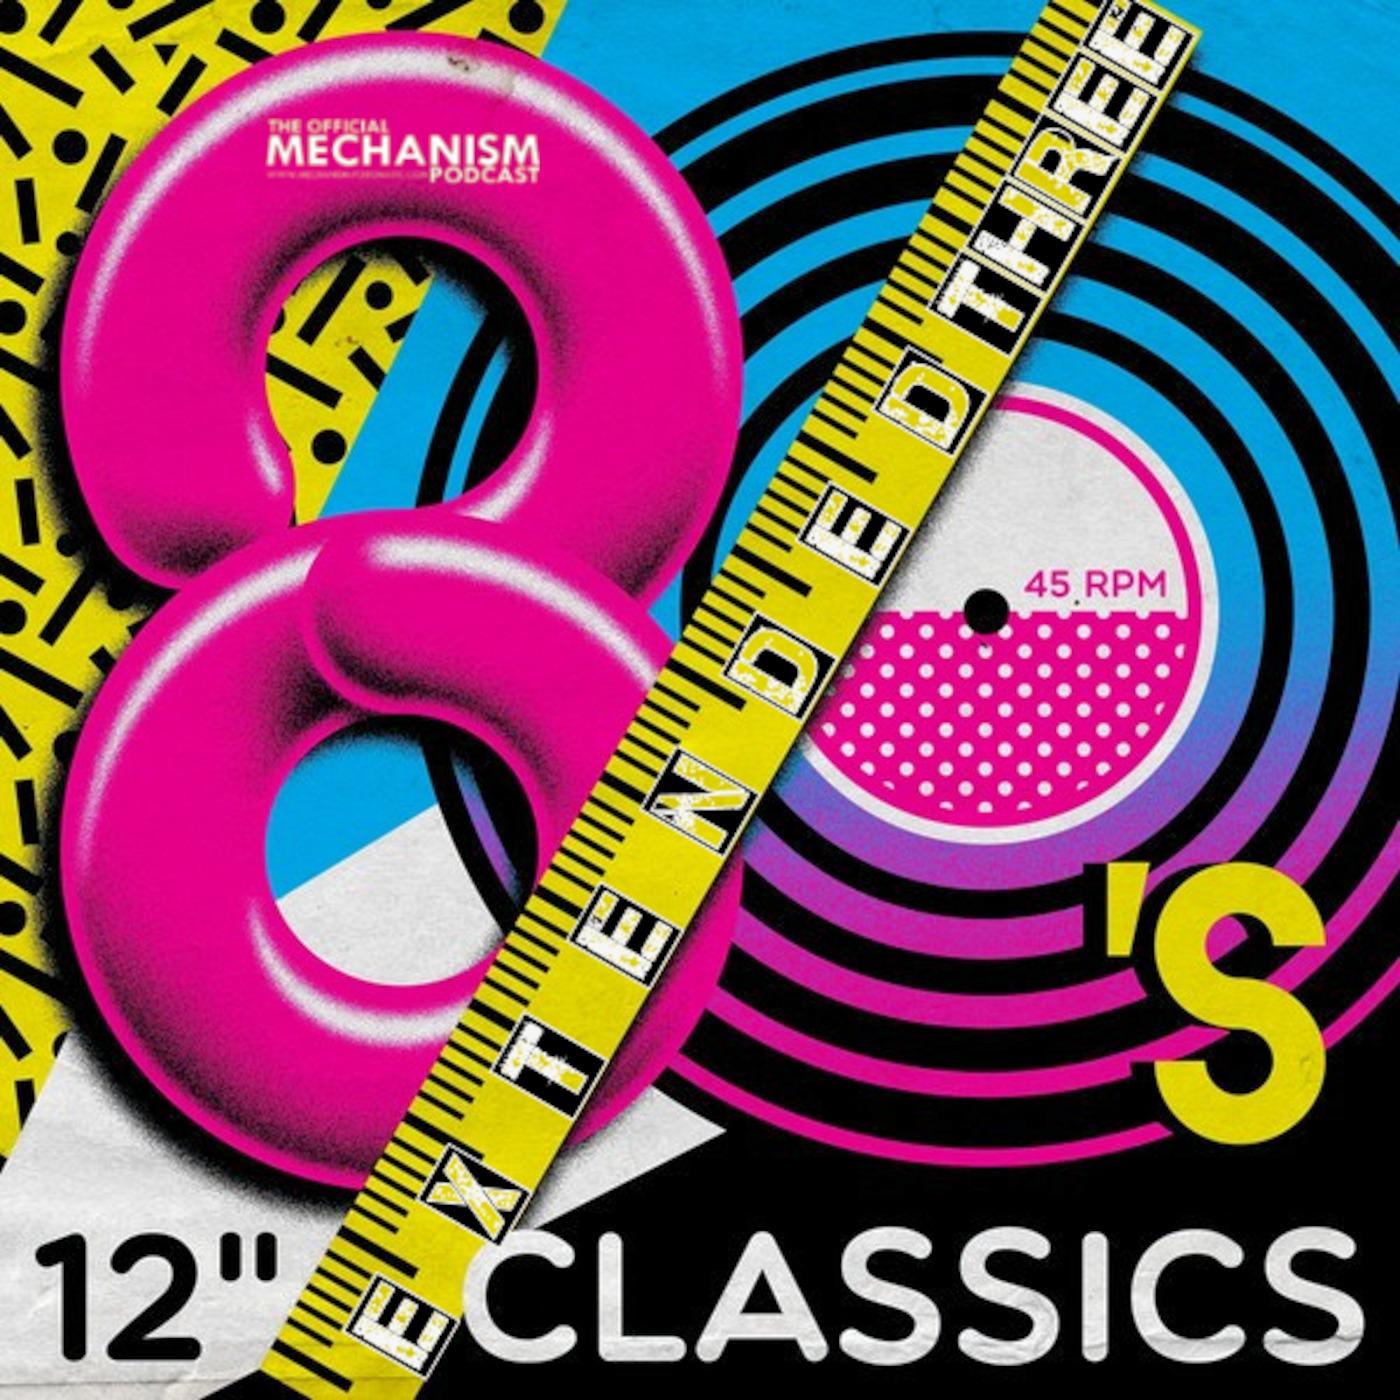 80s Songs 126 Bpm